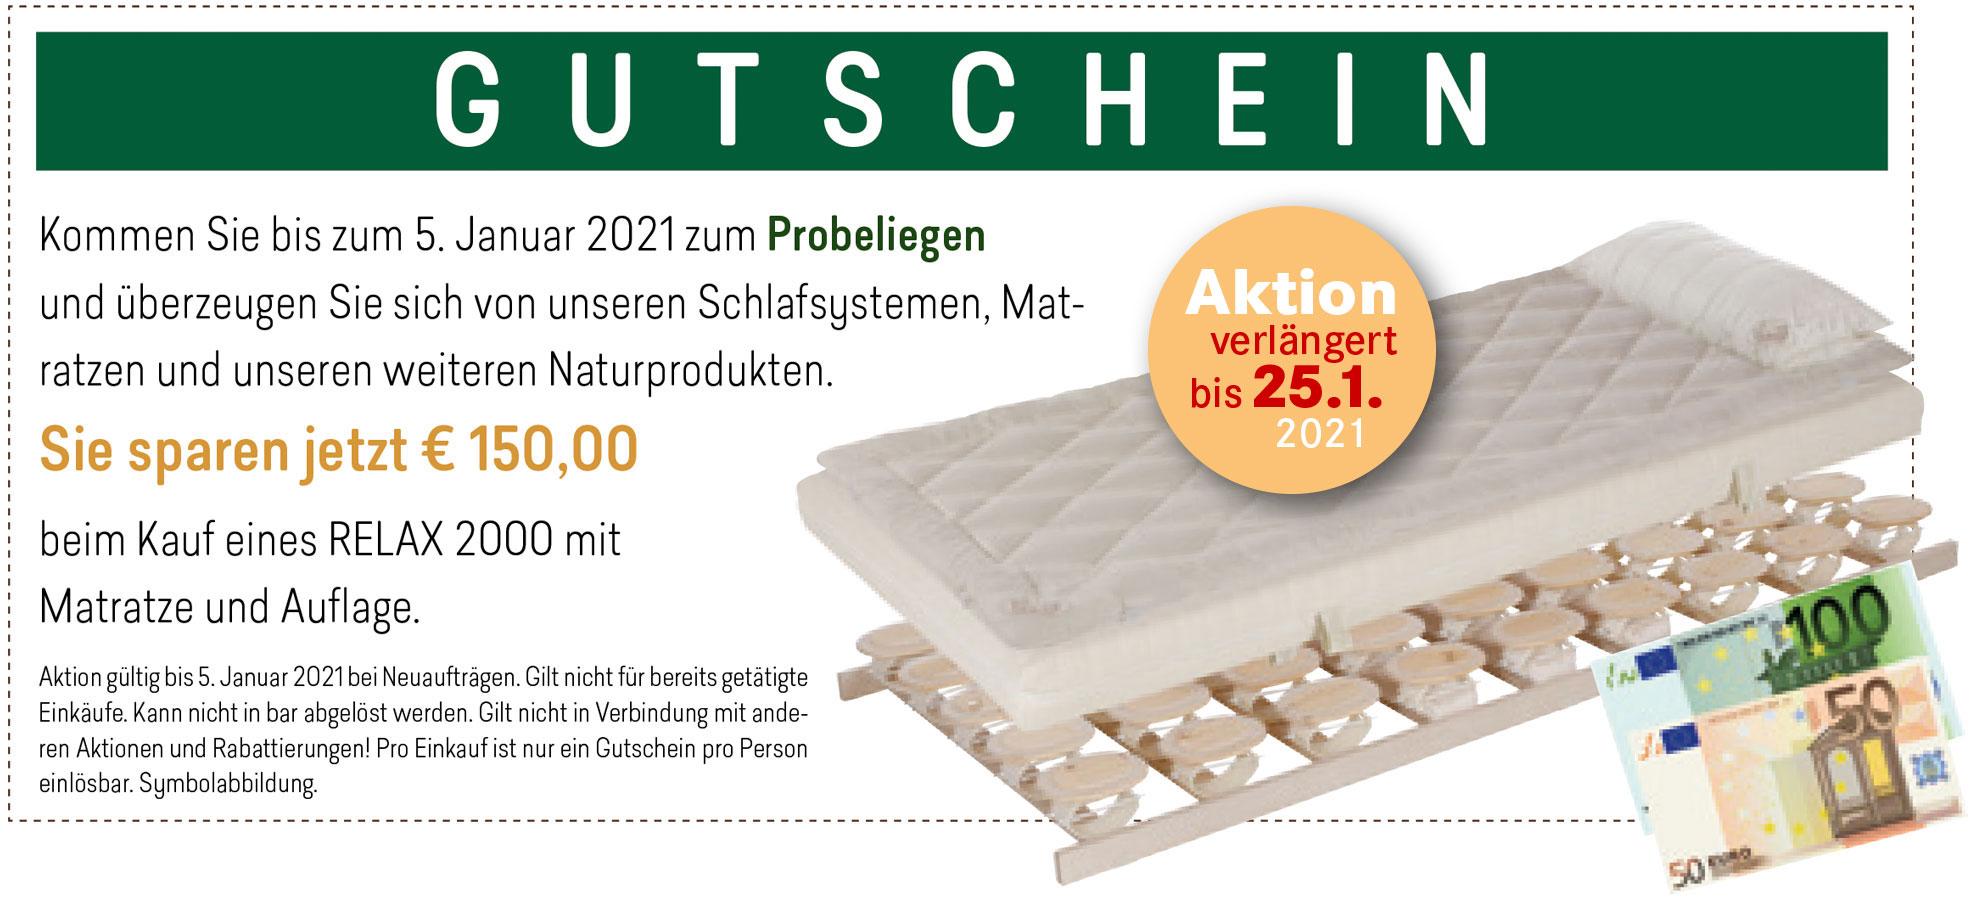 Zirben-Aktionswochen 2020/21 verlängert